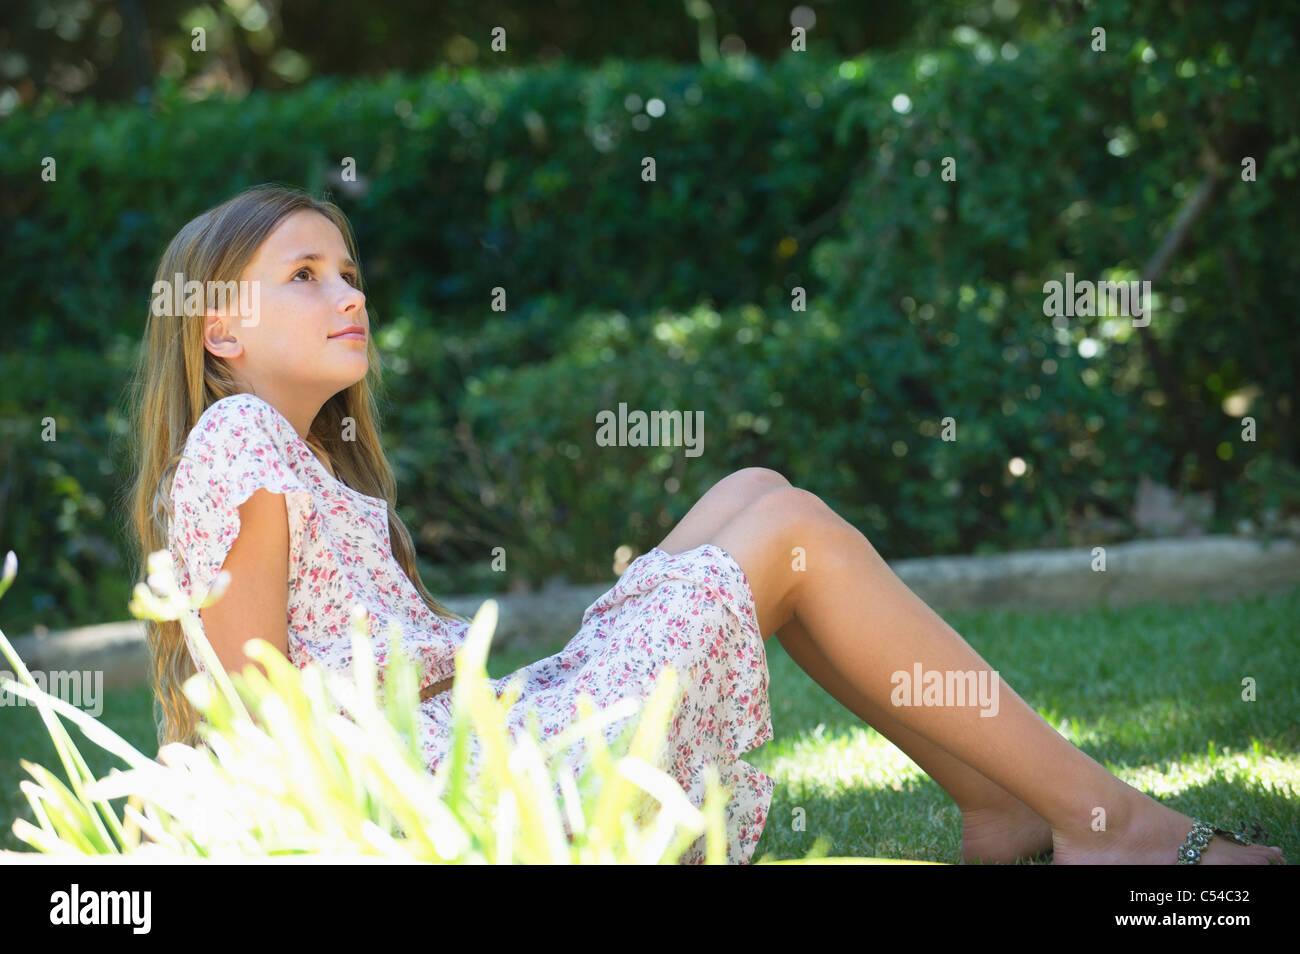 Contemplative little girl looking up in garden Stock Photo